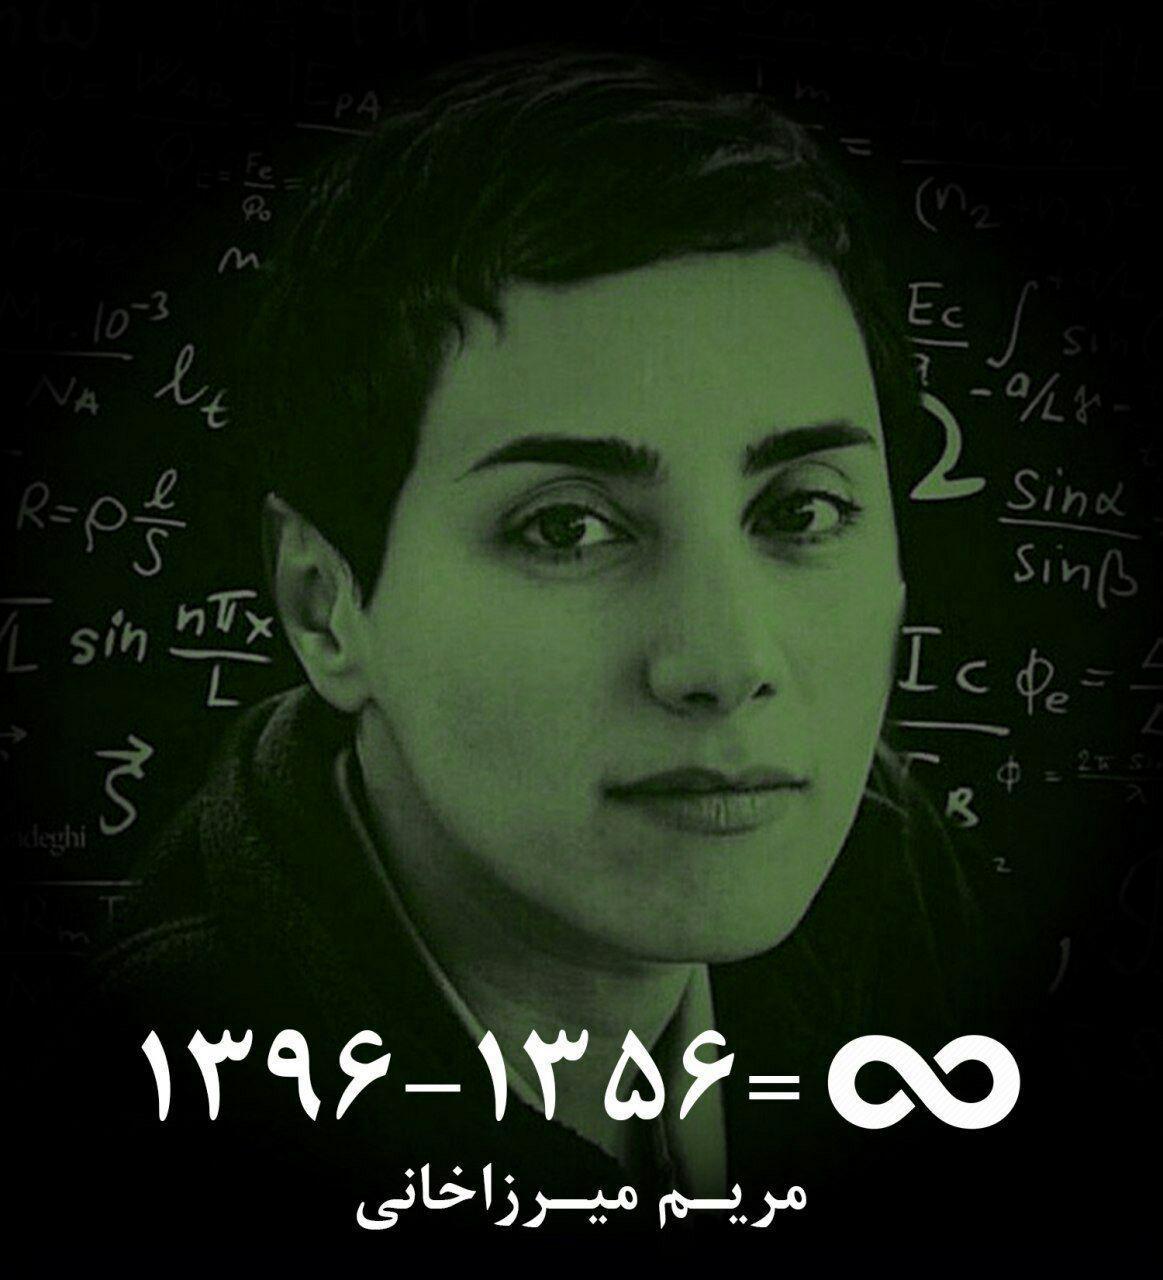 http://s9.picofile.com/file/8300872484/Maryam_Mirzakhani.jpg